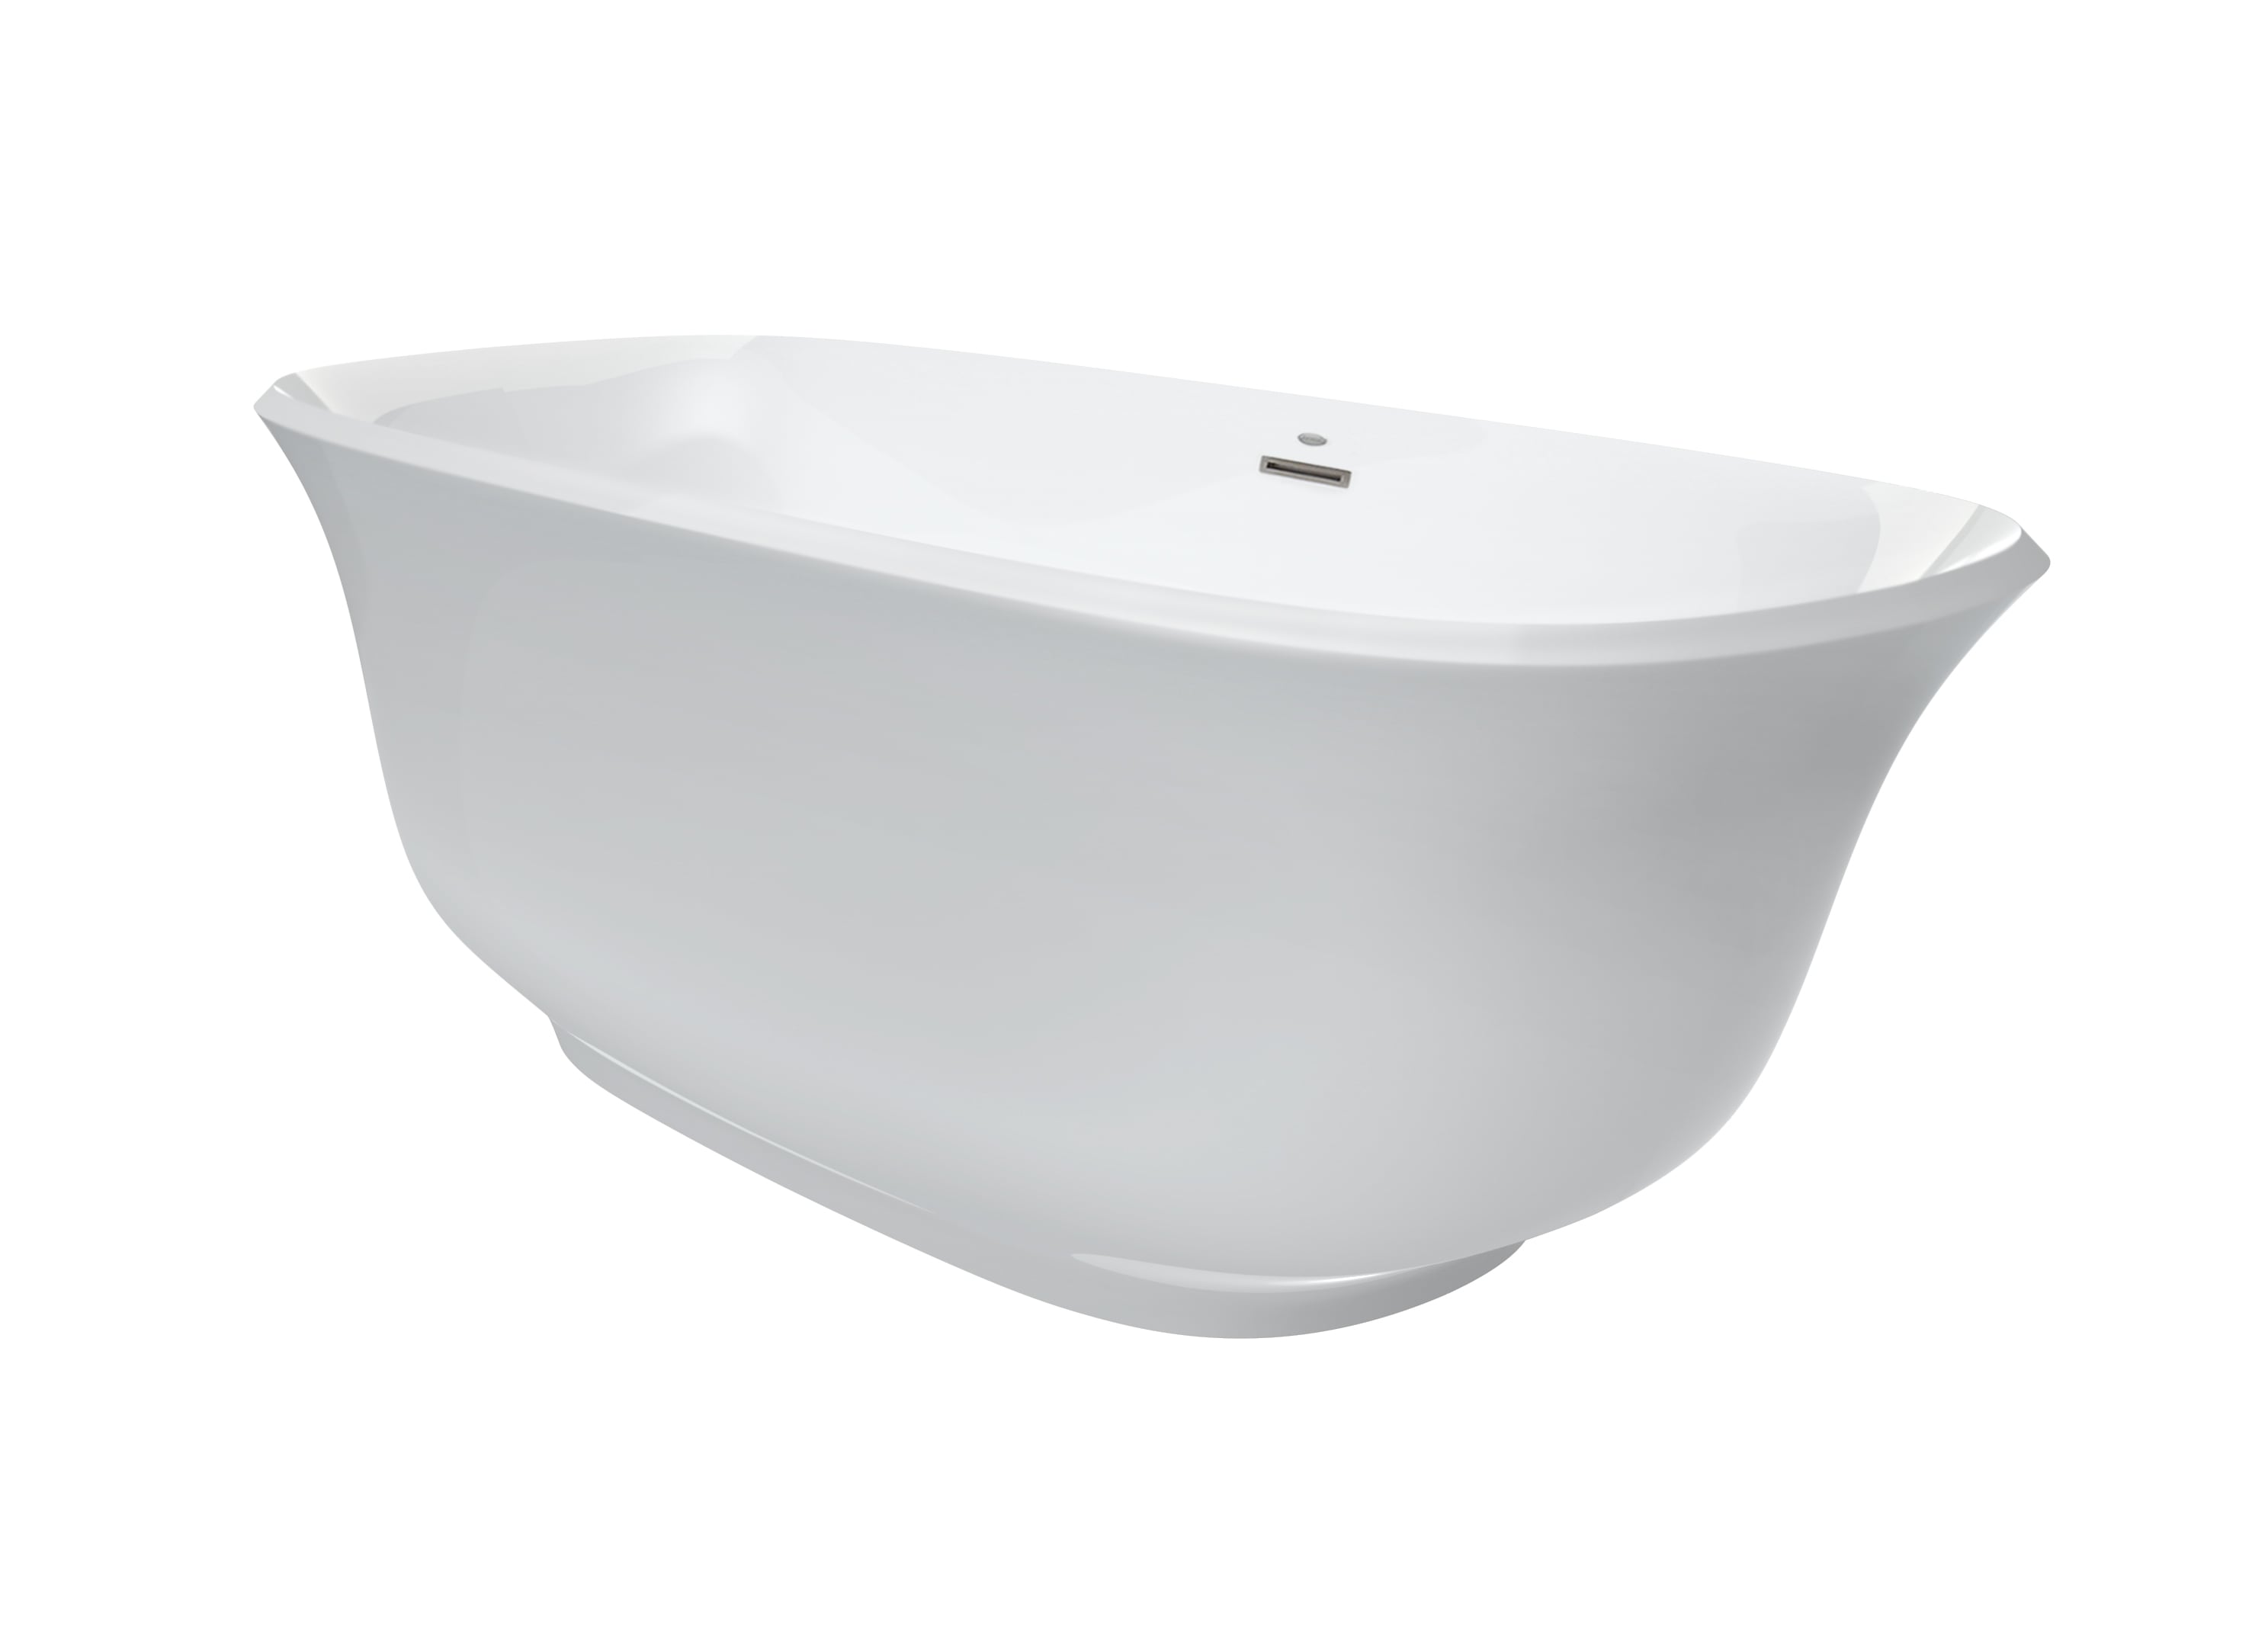 Jacuzzi Azf6731Bcxxxxw White Chrome Azzurro 67 Freestanding Soaking Bathtub With